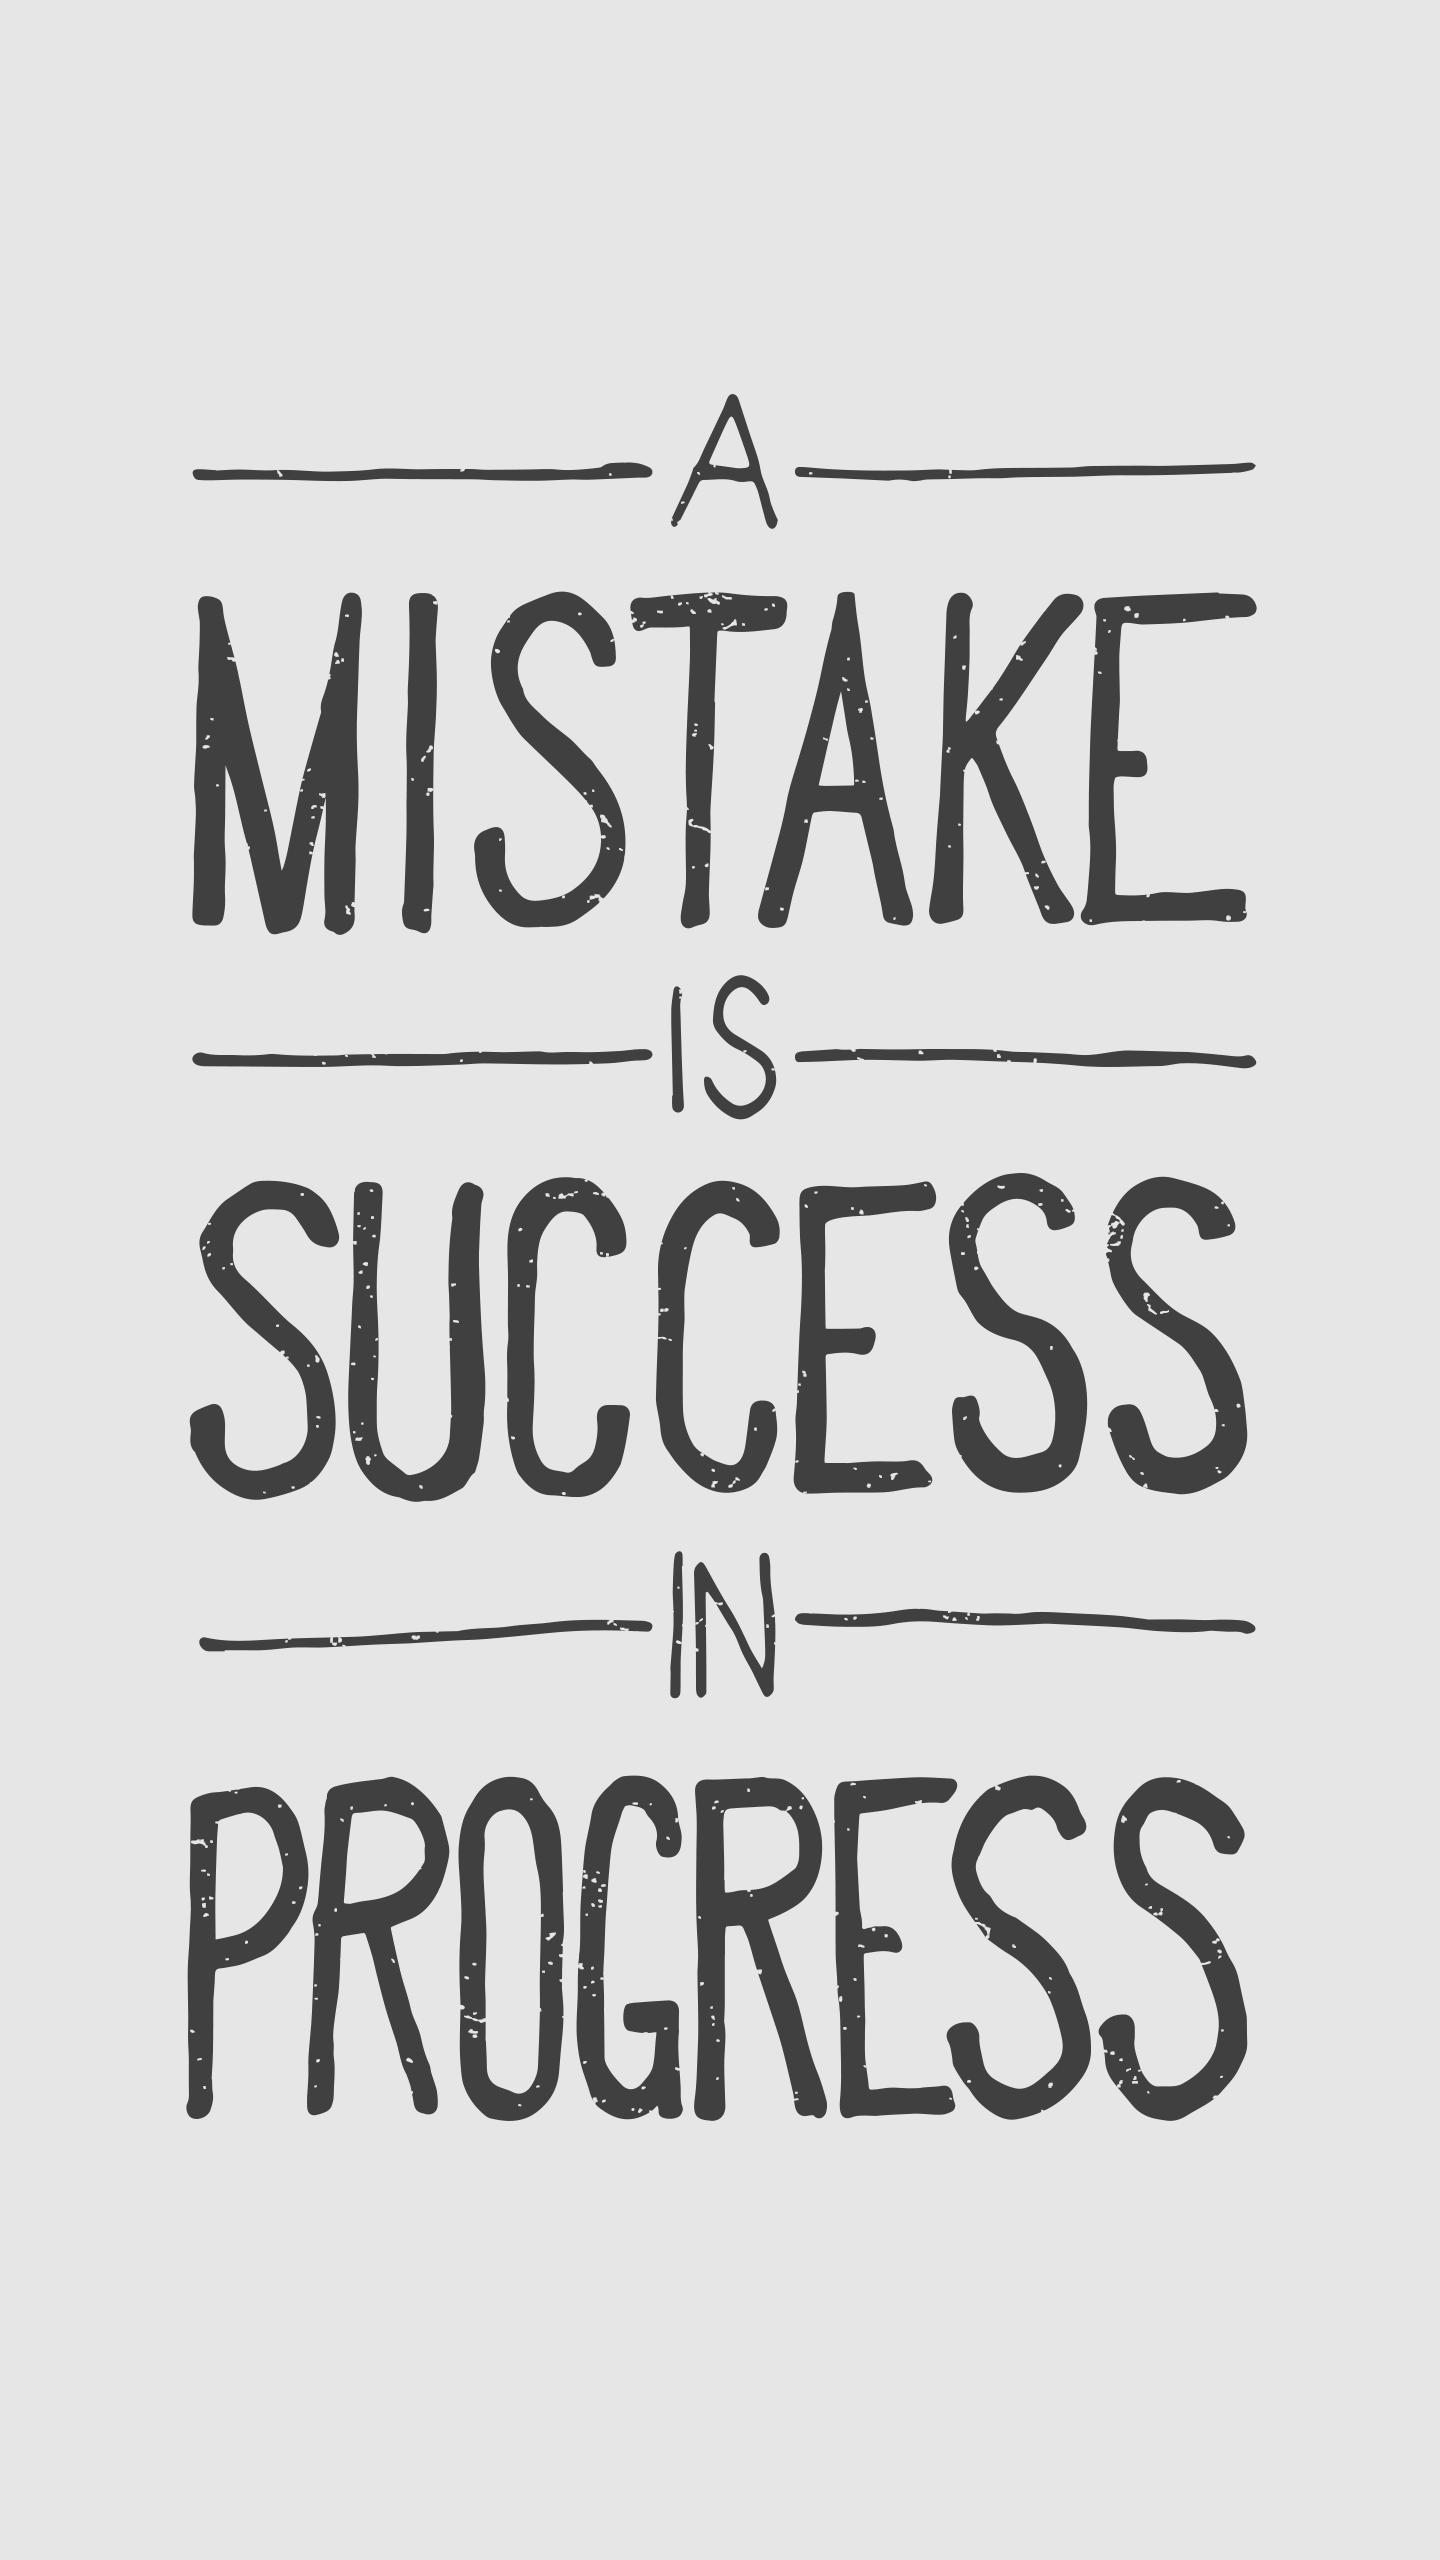 Success Quote iPhone Wallpaper